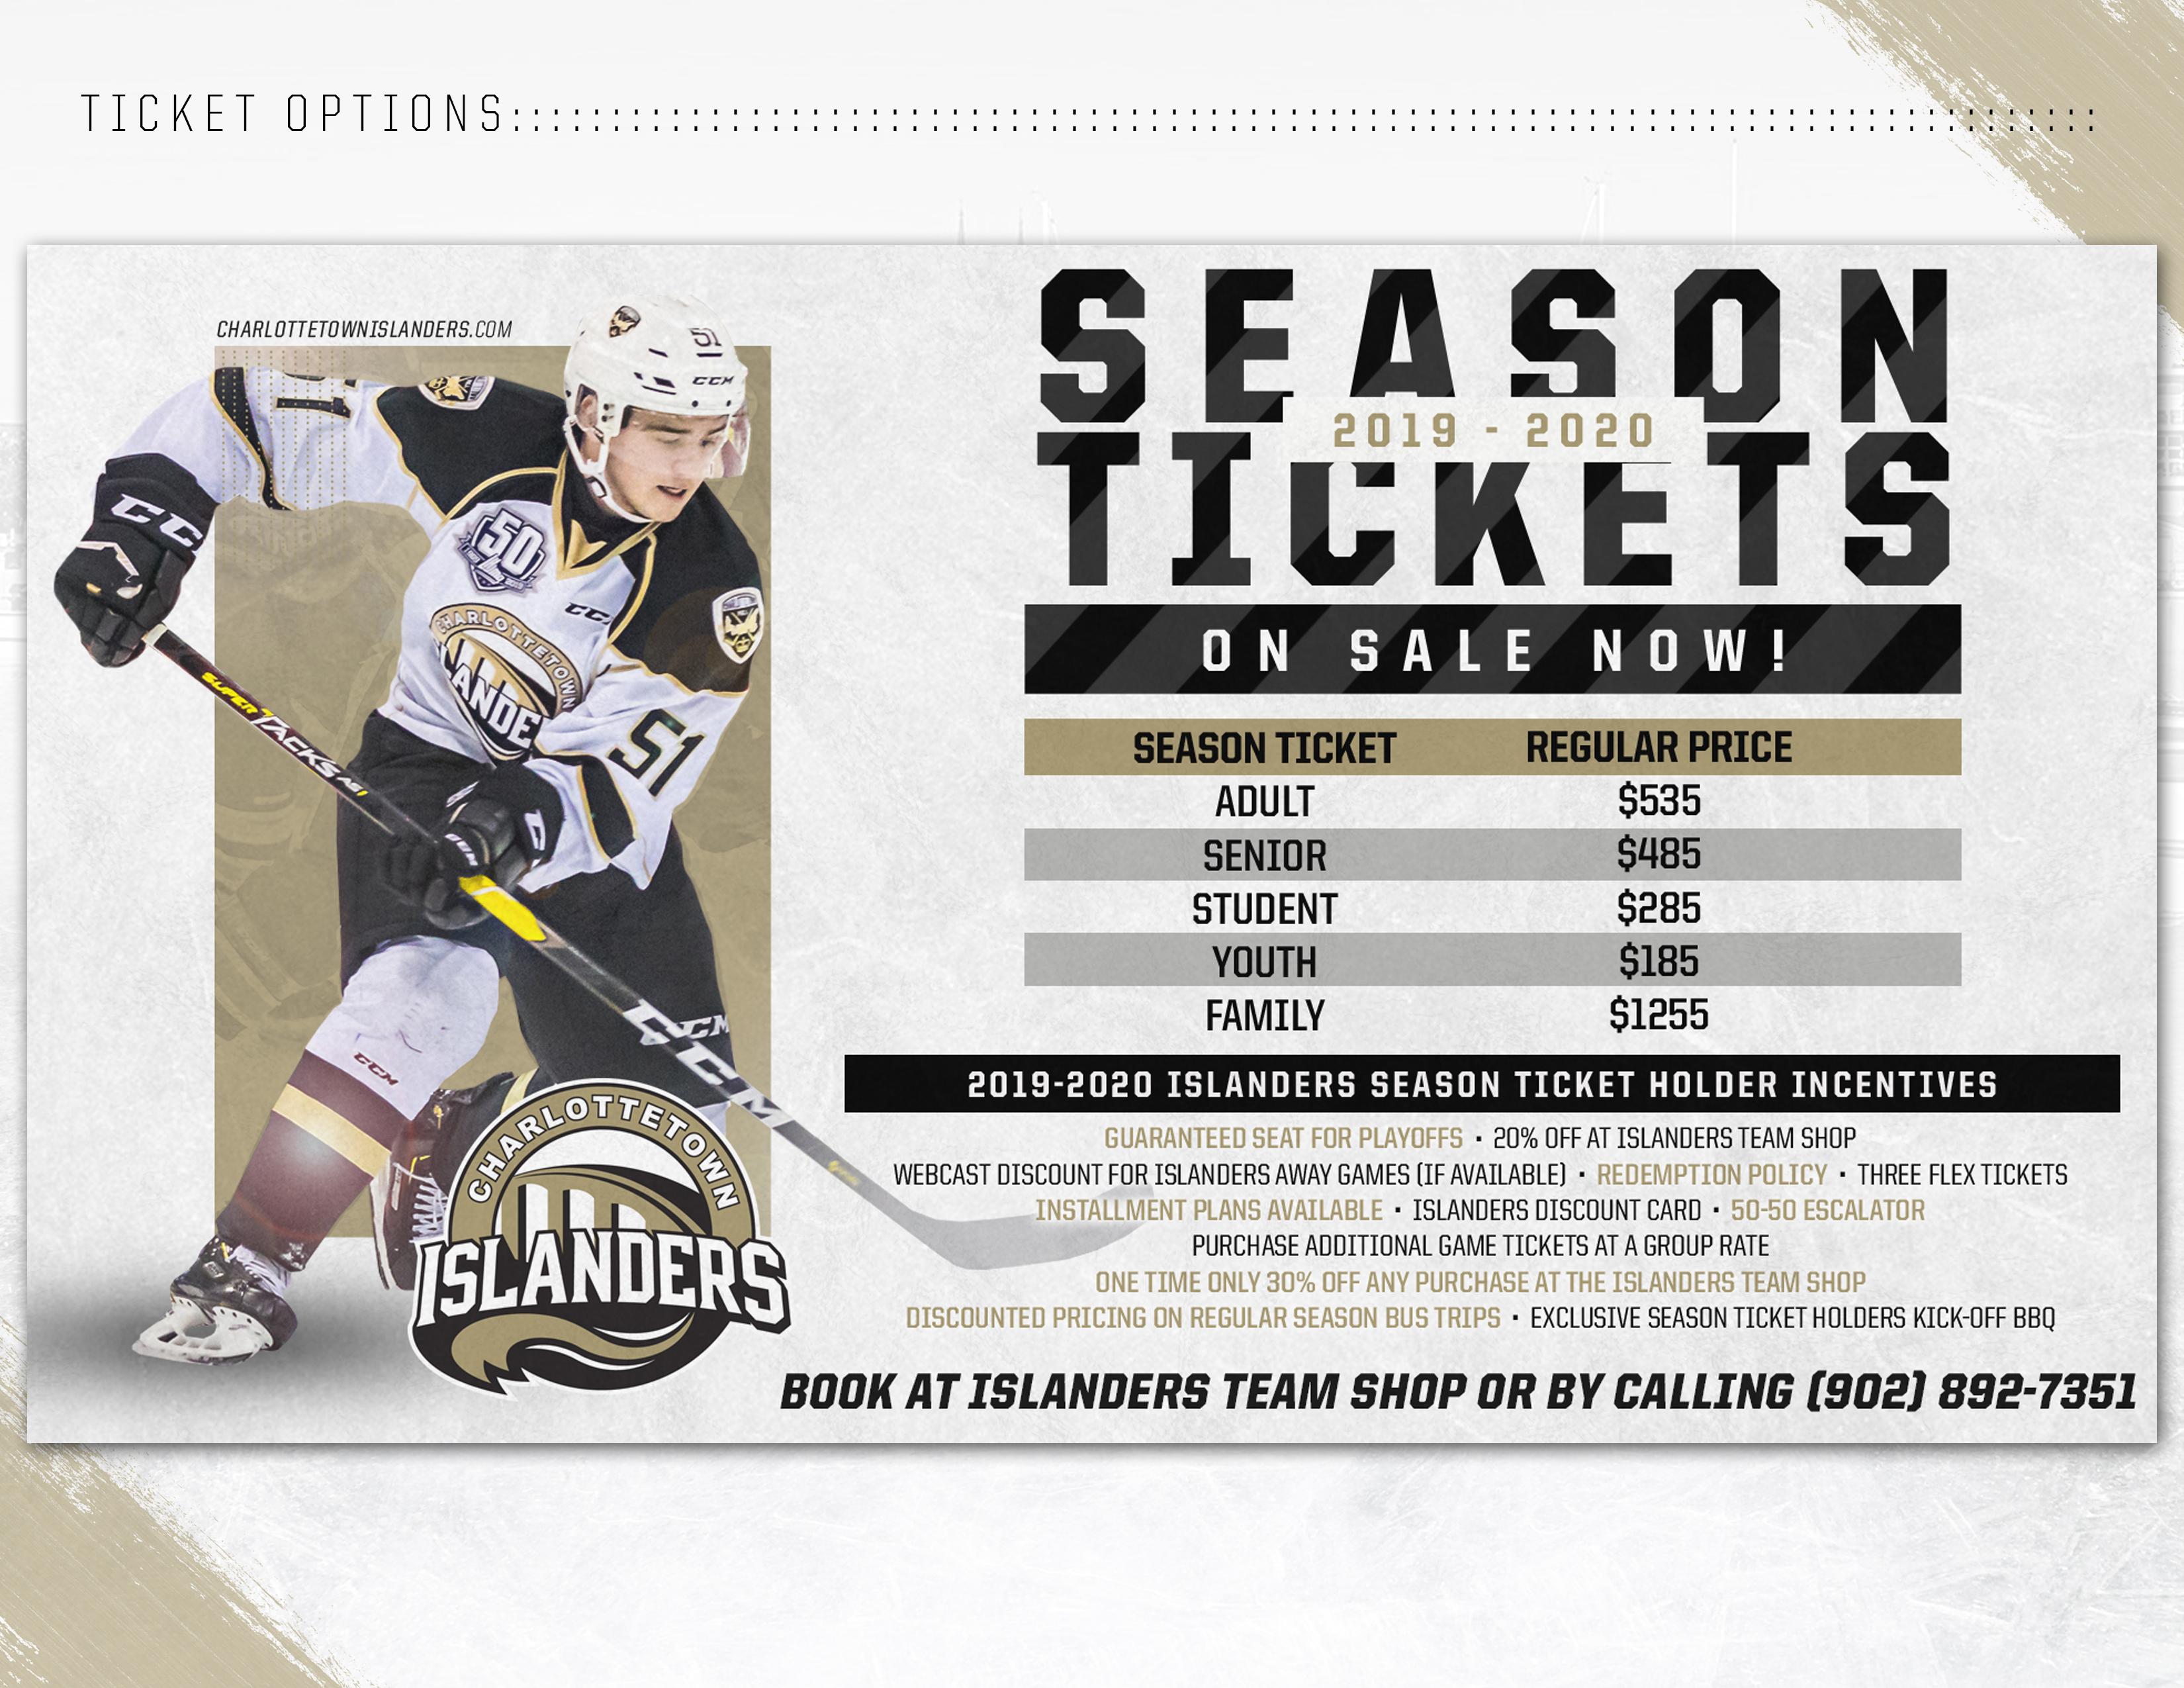 44---Season-ticket-options